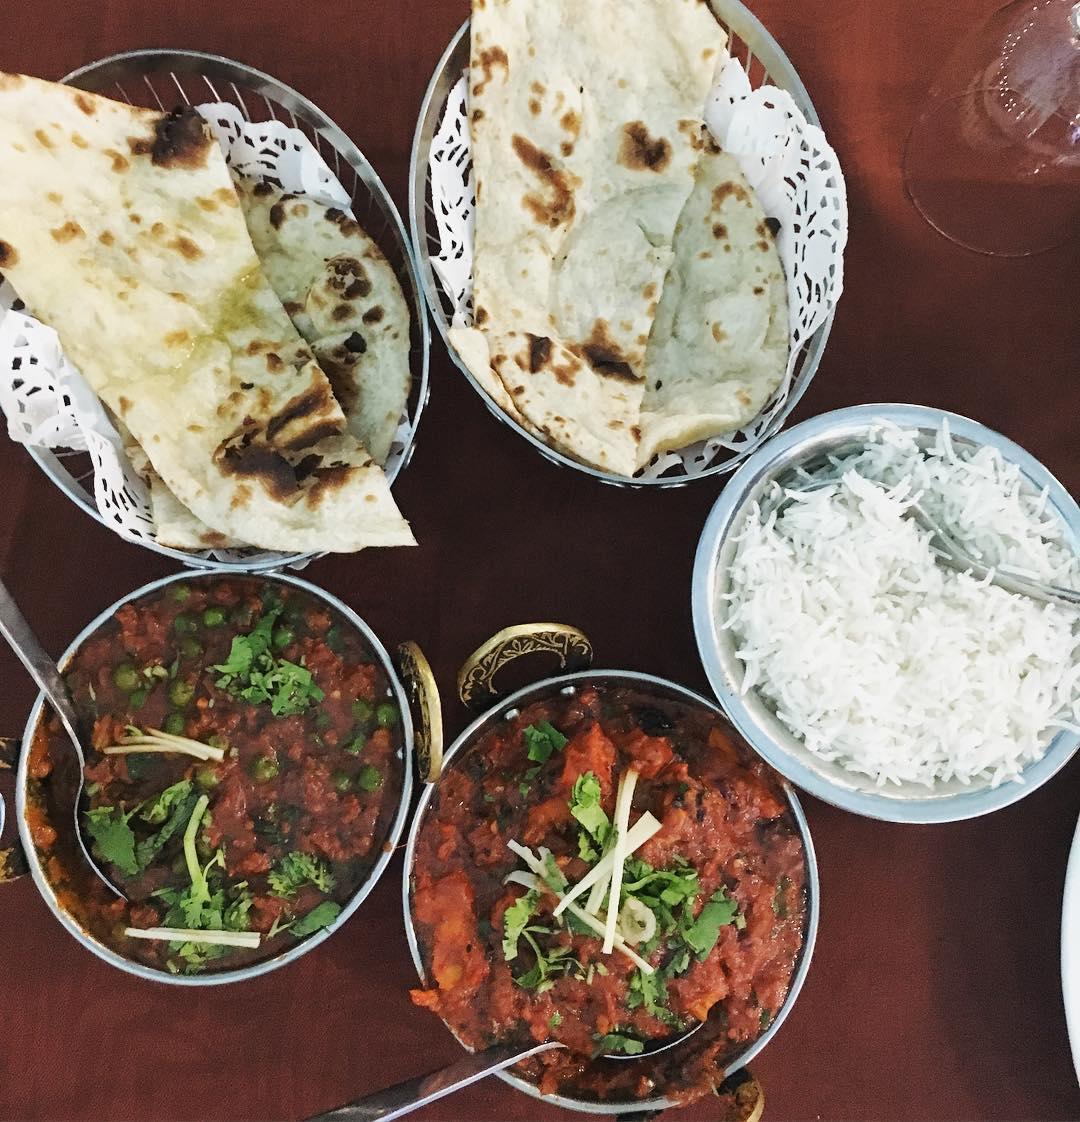 10 rooftop restaurants - Kebabs and curries